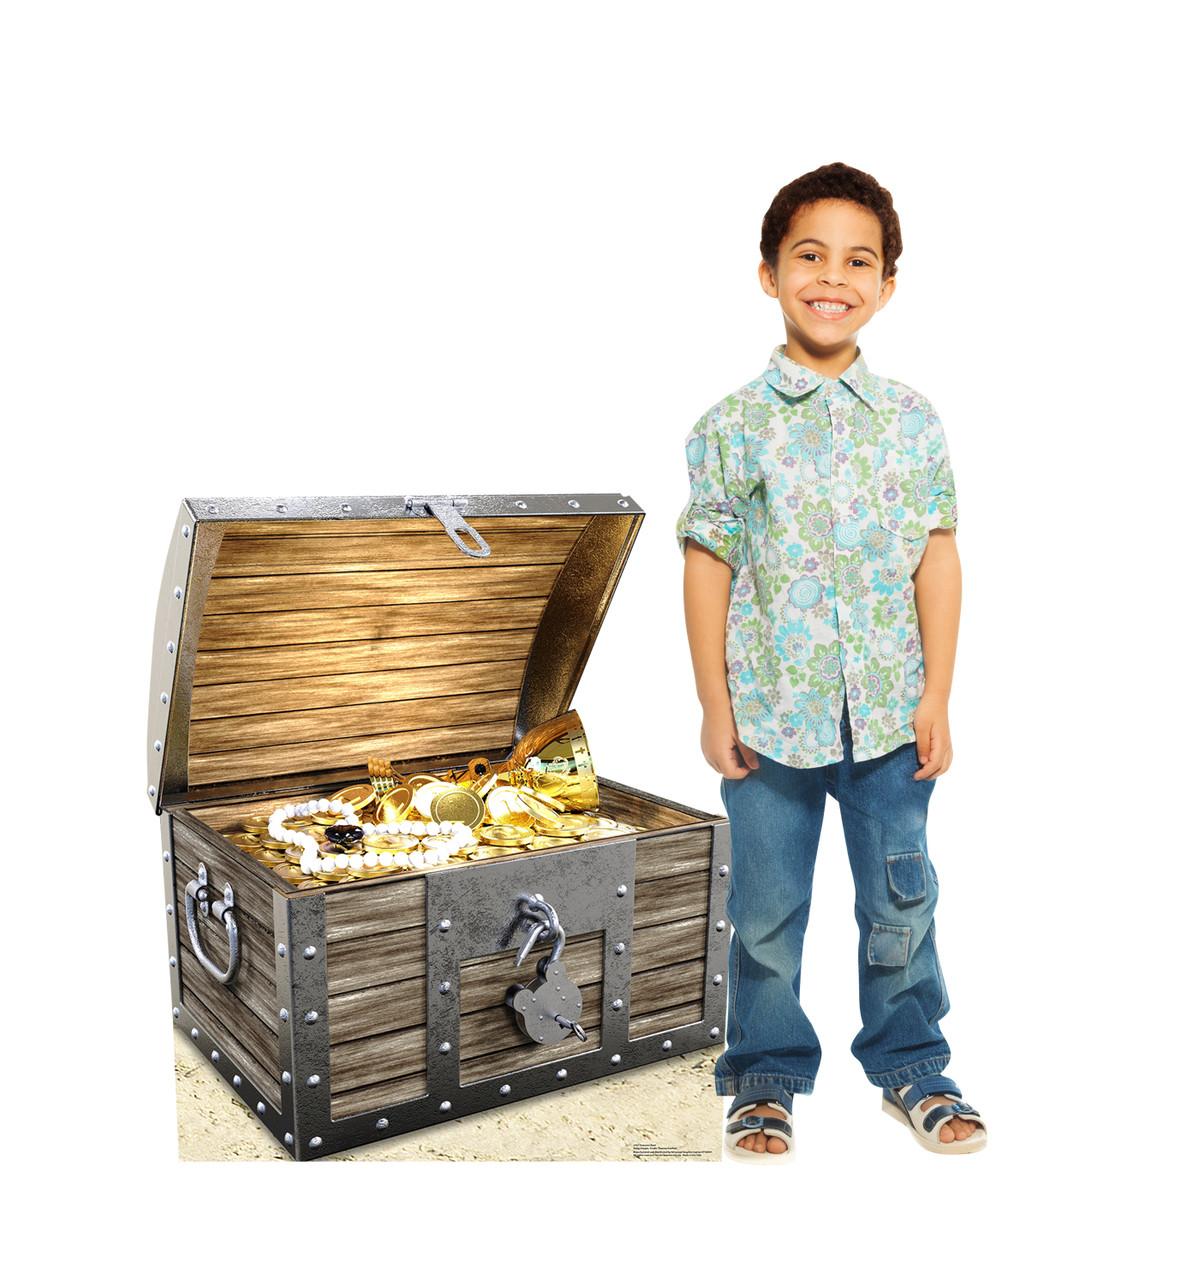 Life-size Treasure Chest Cardboard Standup | Cardboard Cutout 2